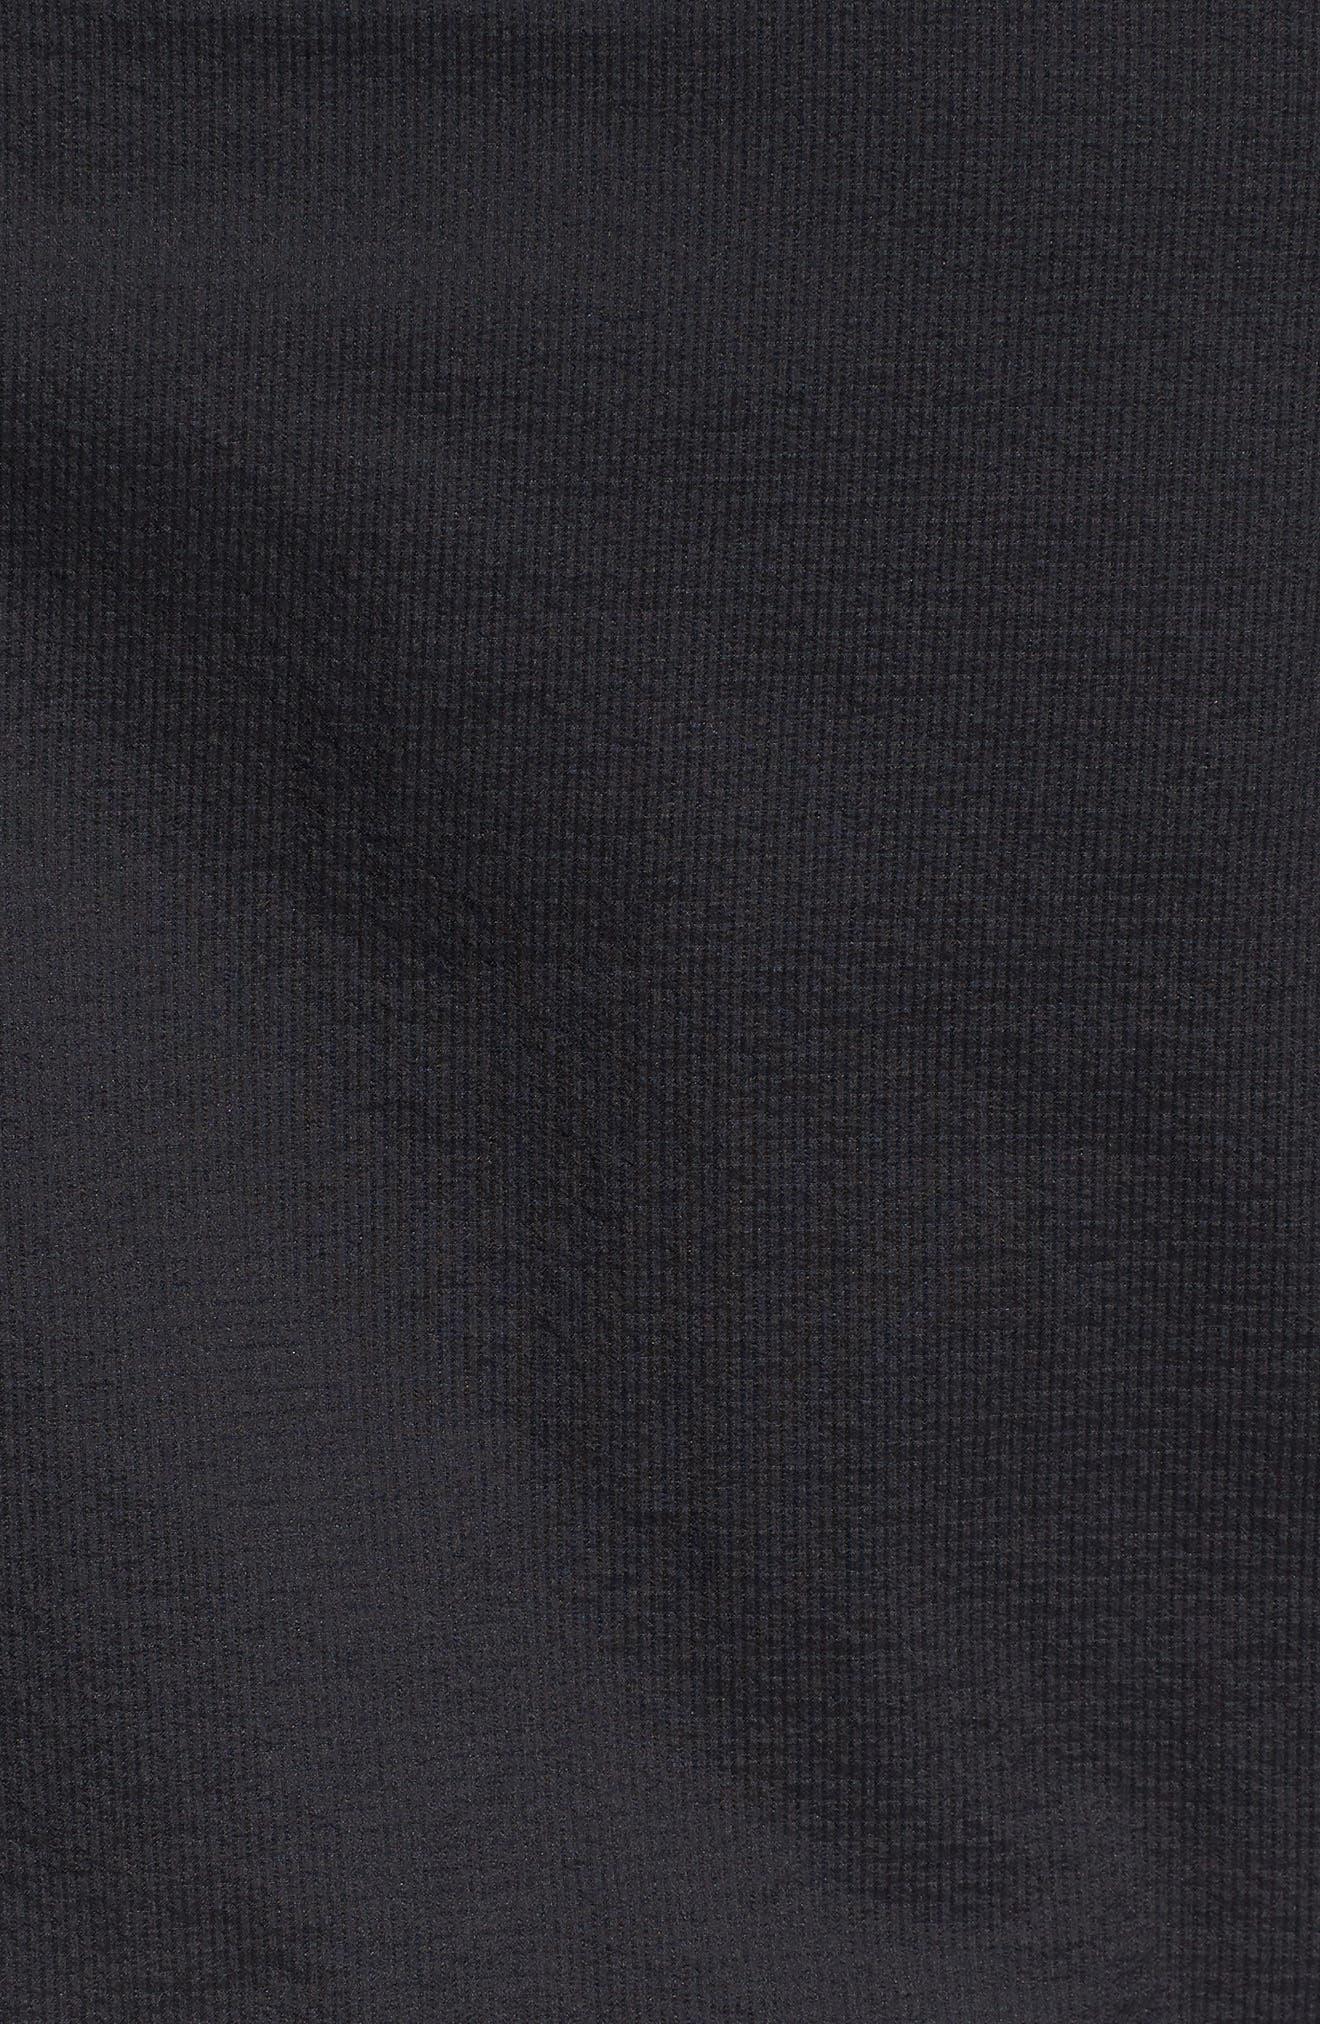 Run Division Jacket,                             Alternate thumbnail 7, color,                             BLACK